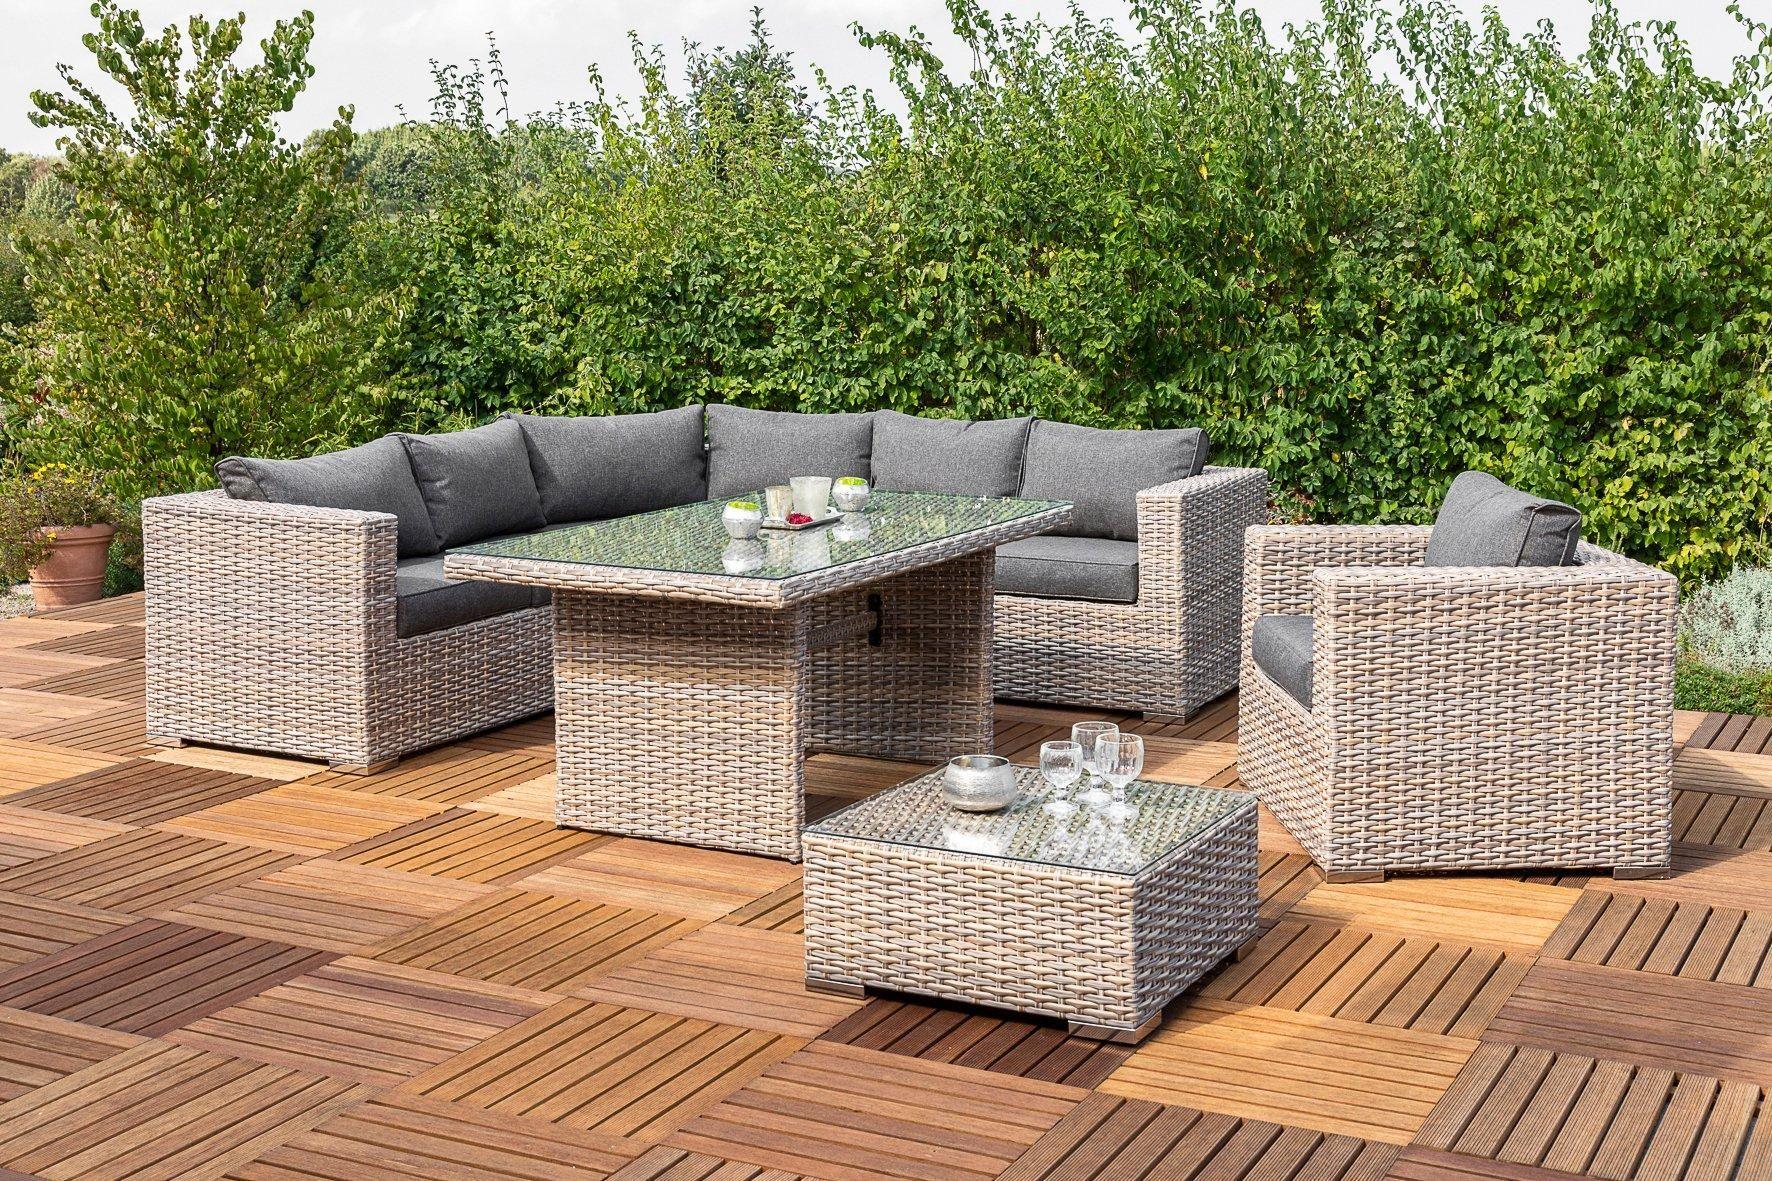 Merxx Loungeset San Priamo 19 Tlg Rundecke Sessel Tisch Loungetisch Polyrattan Lounge Tisch Lounge Mobel Lounge